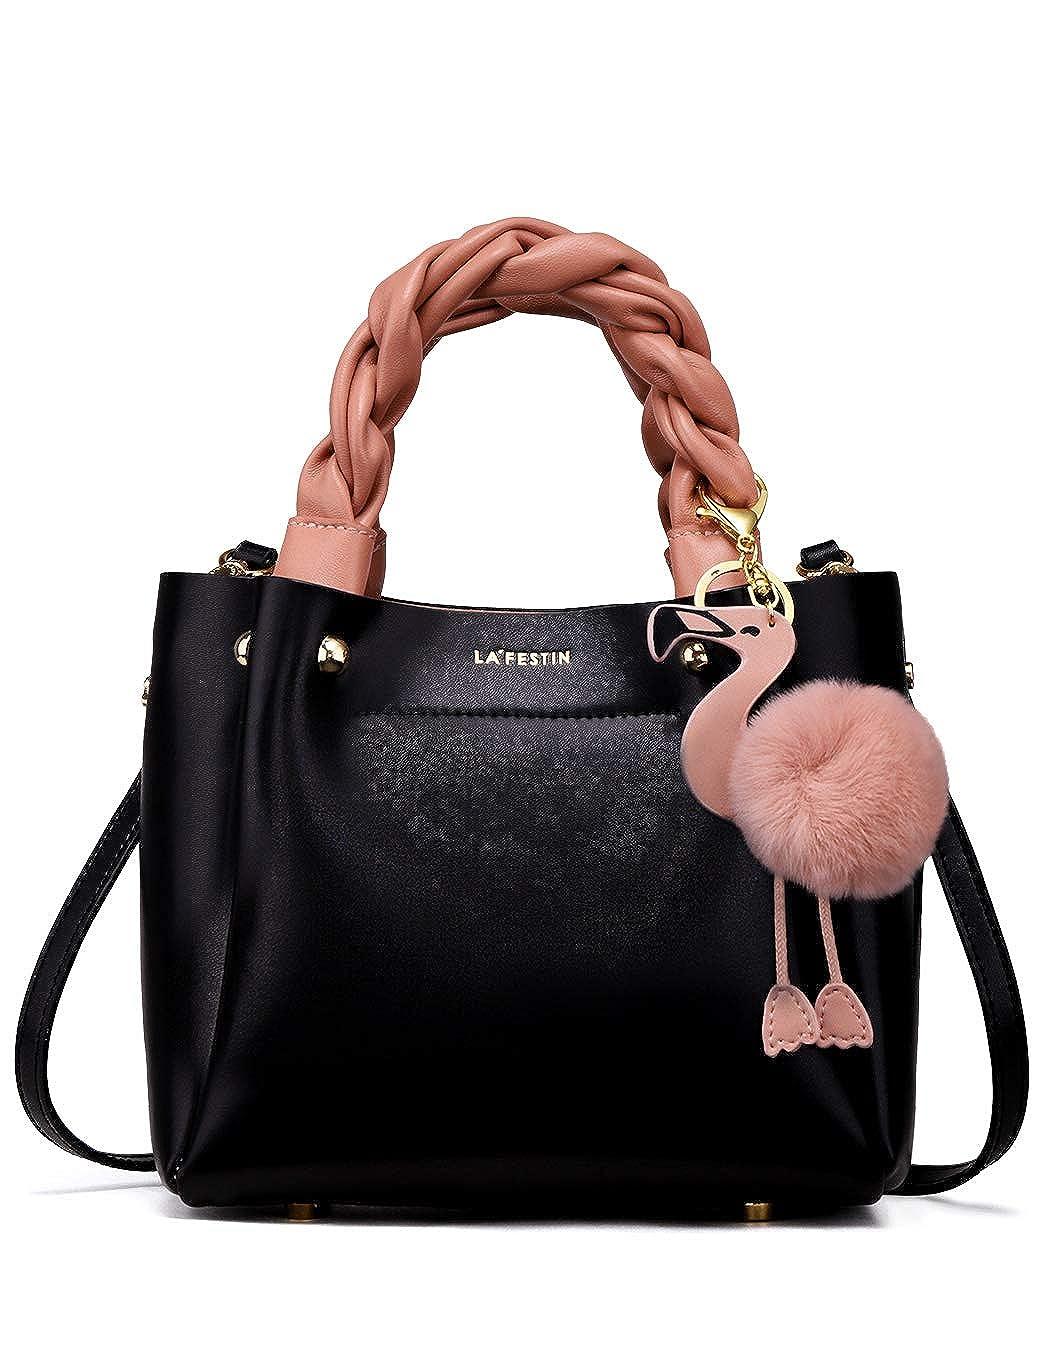 35eaaed35adc LA FESTIN Designer Fashion Shoulder Tote bag Handbags in Genuine Leather